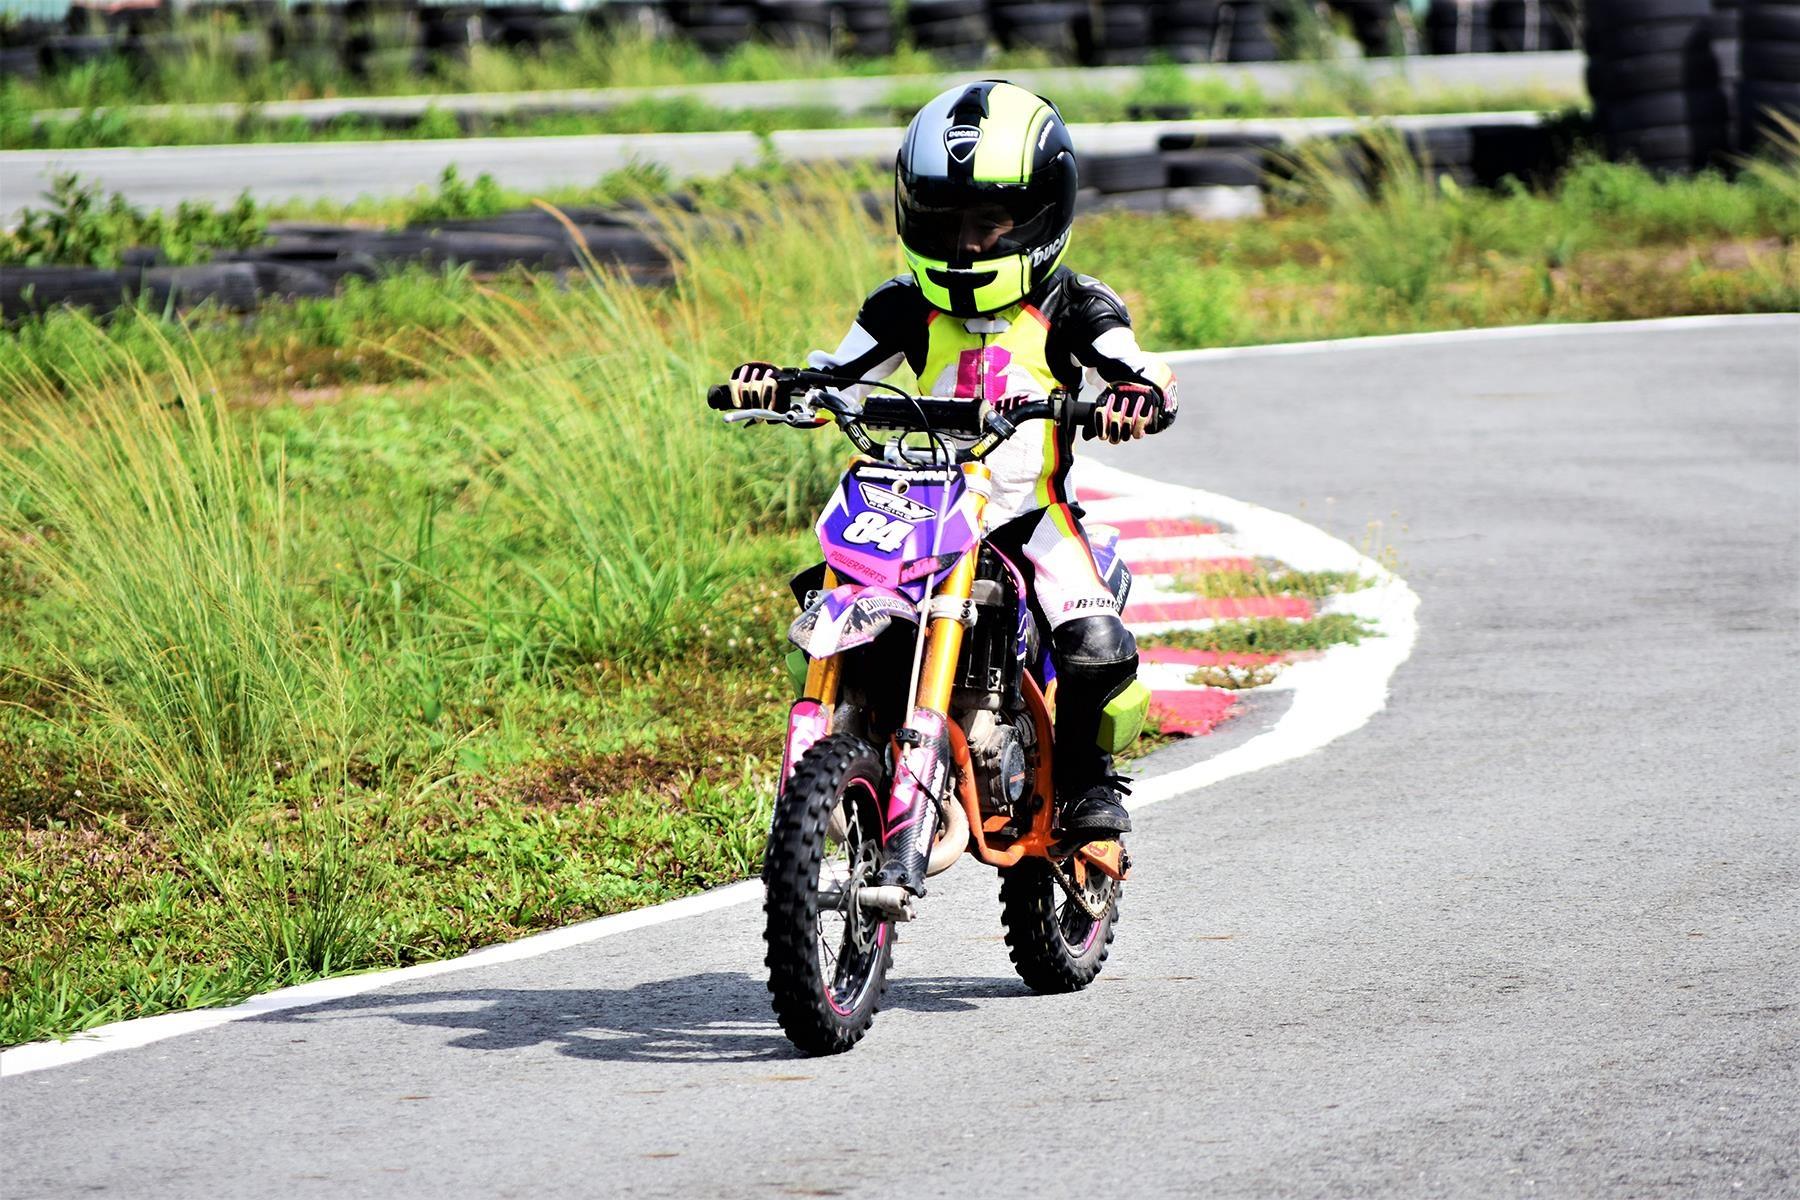 Cau be 7 tuoi uoc mo tro thanh tay dua Moto GP dau tien tai VN hinh anh 15